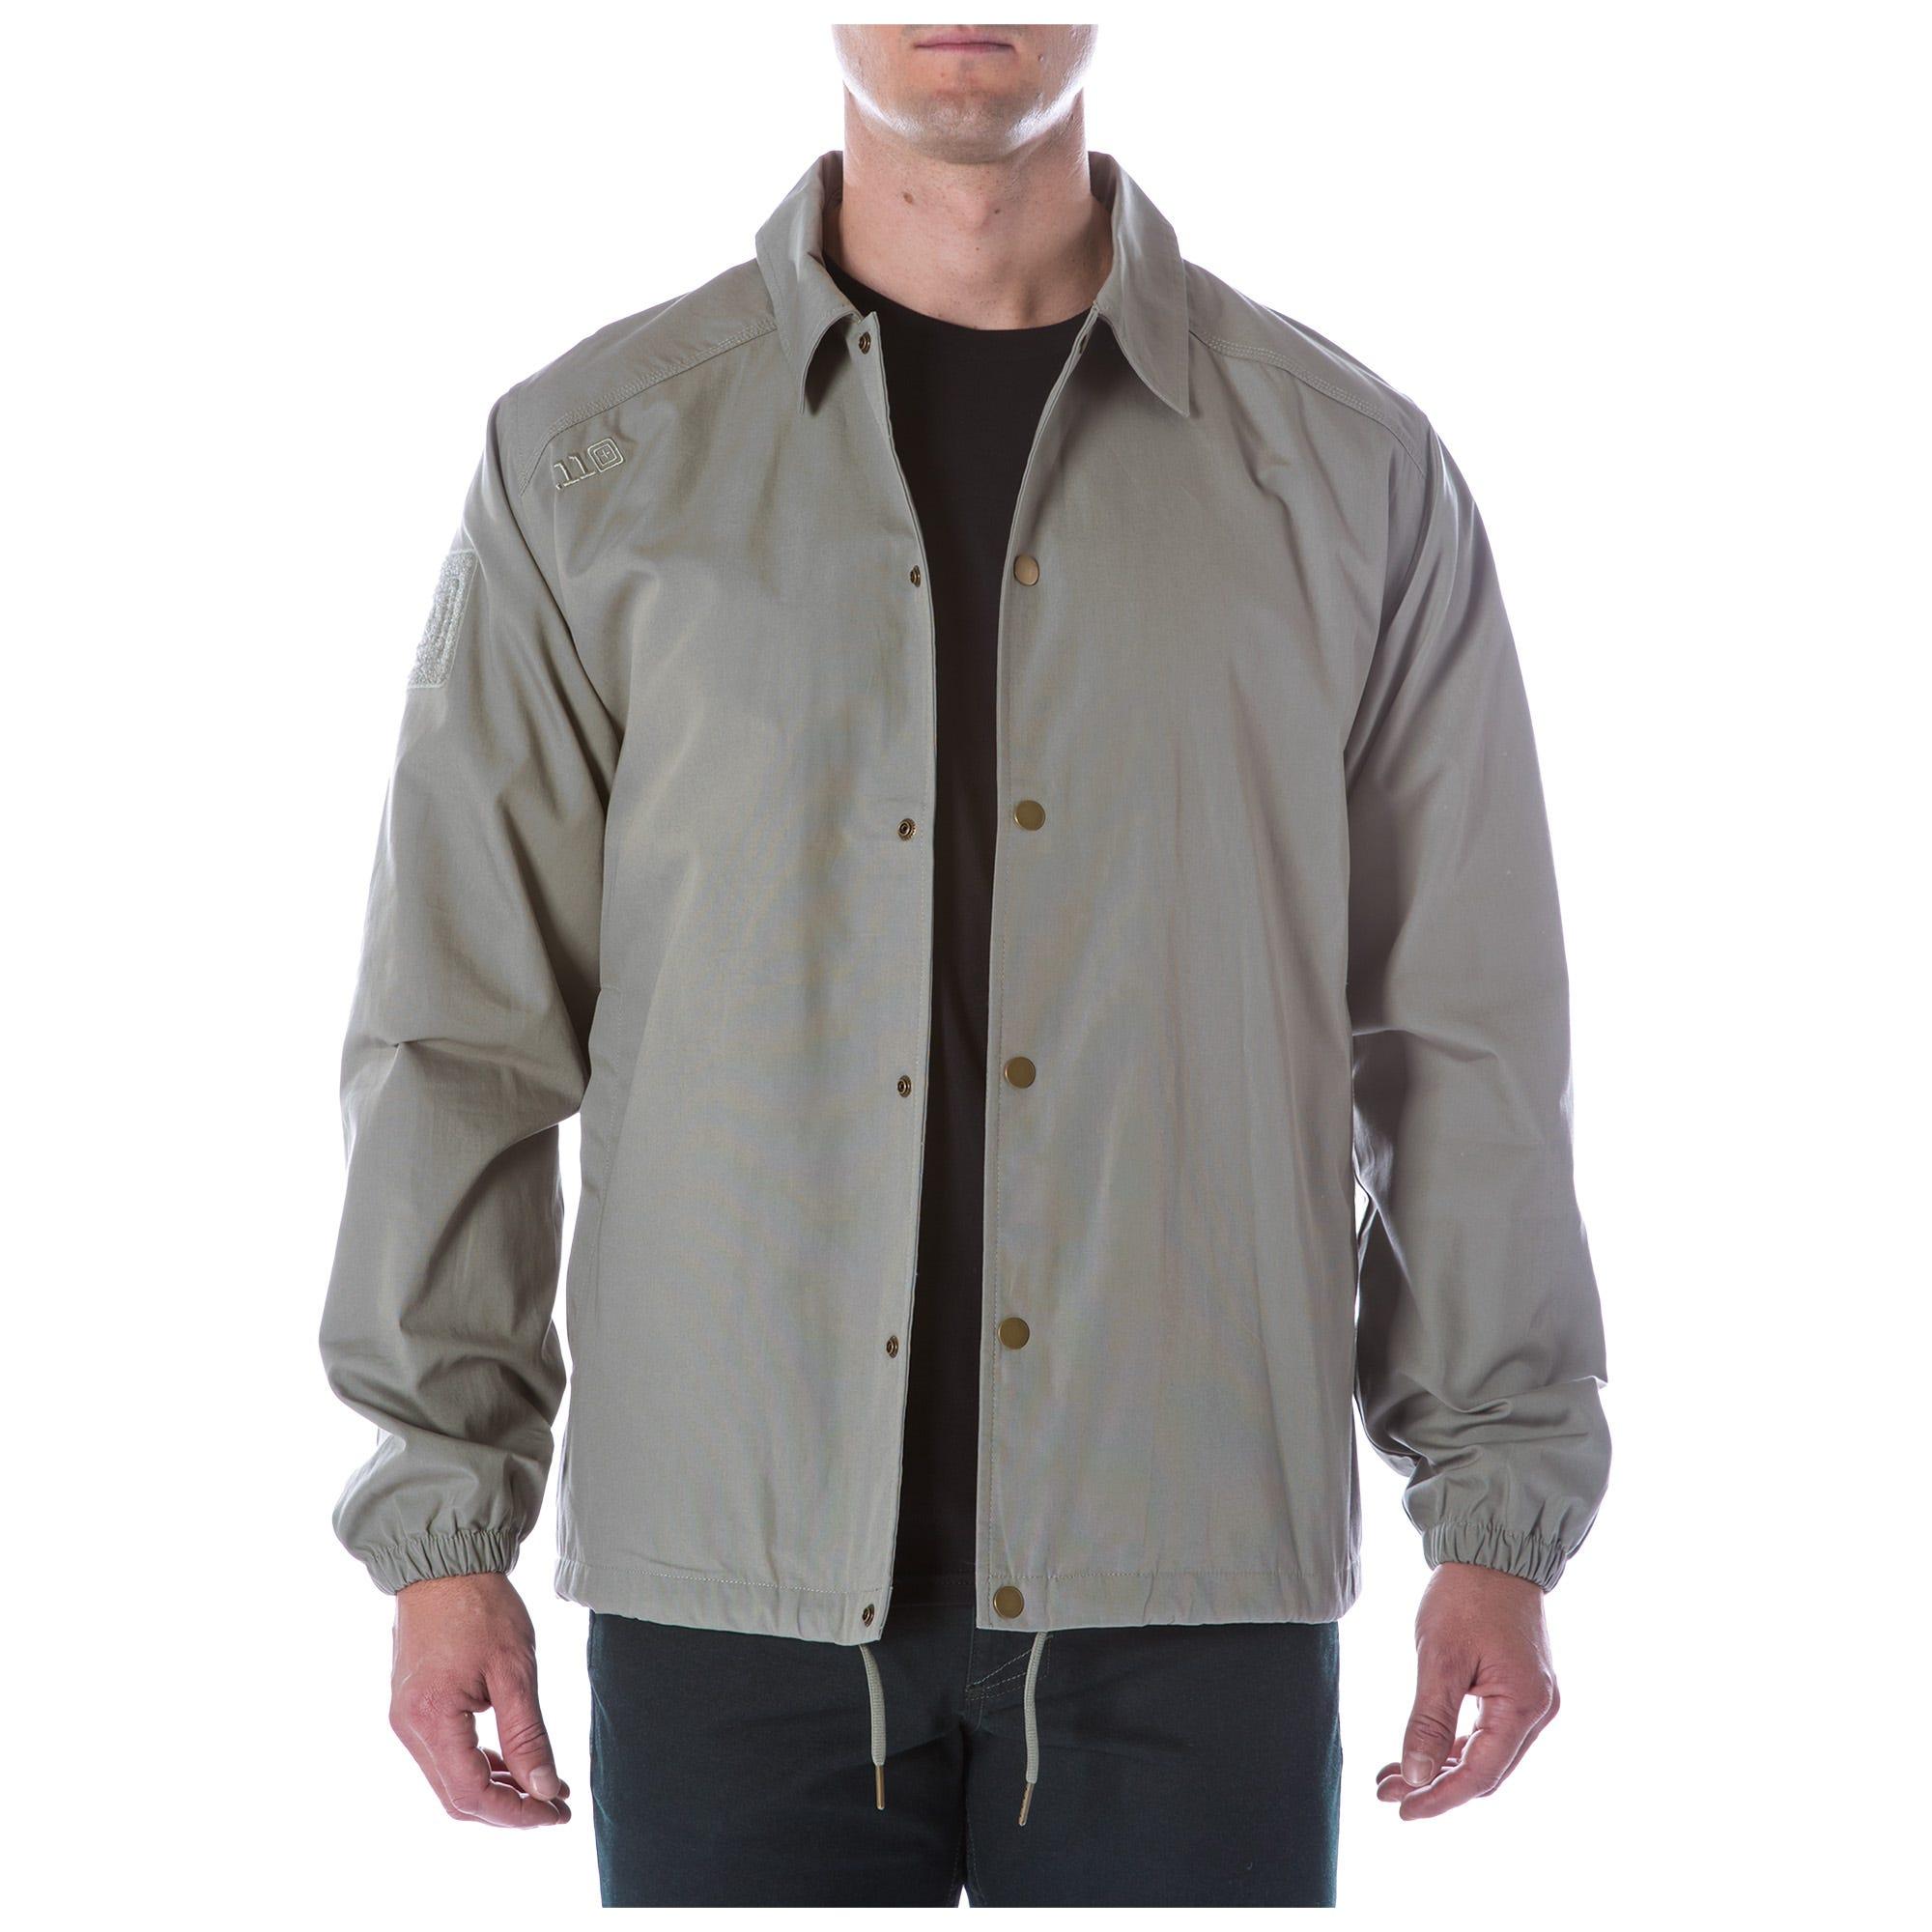 5.11 Tactical Men's Crest Coaches Jacket (Grey)